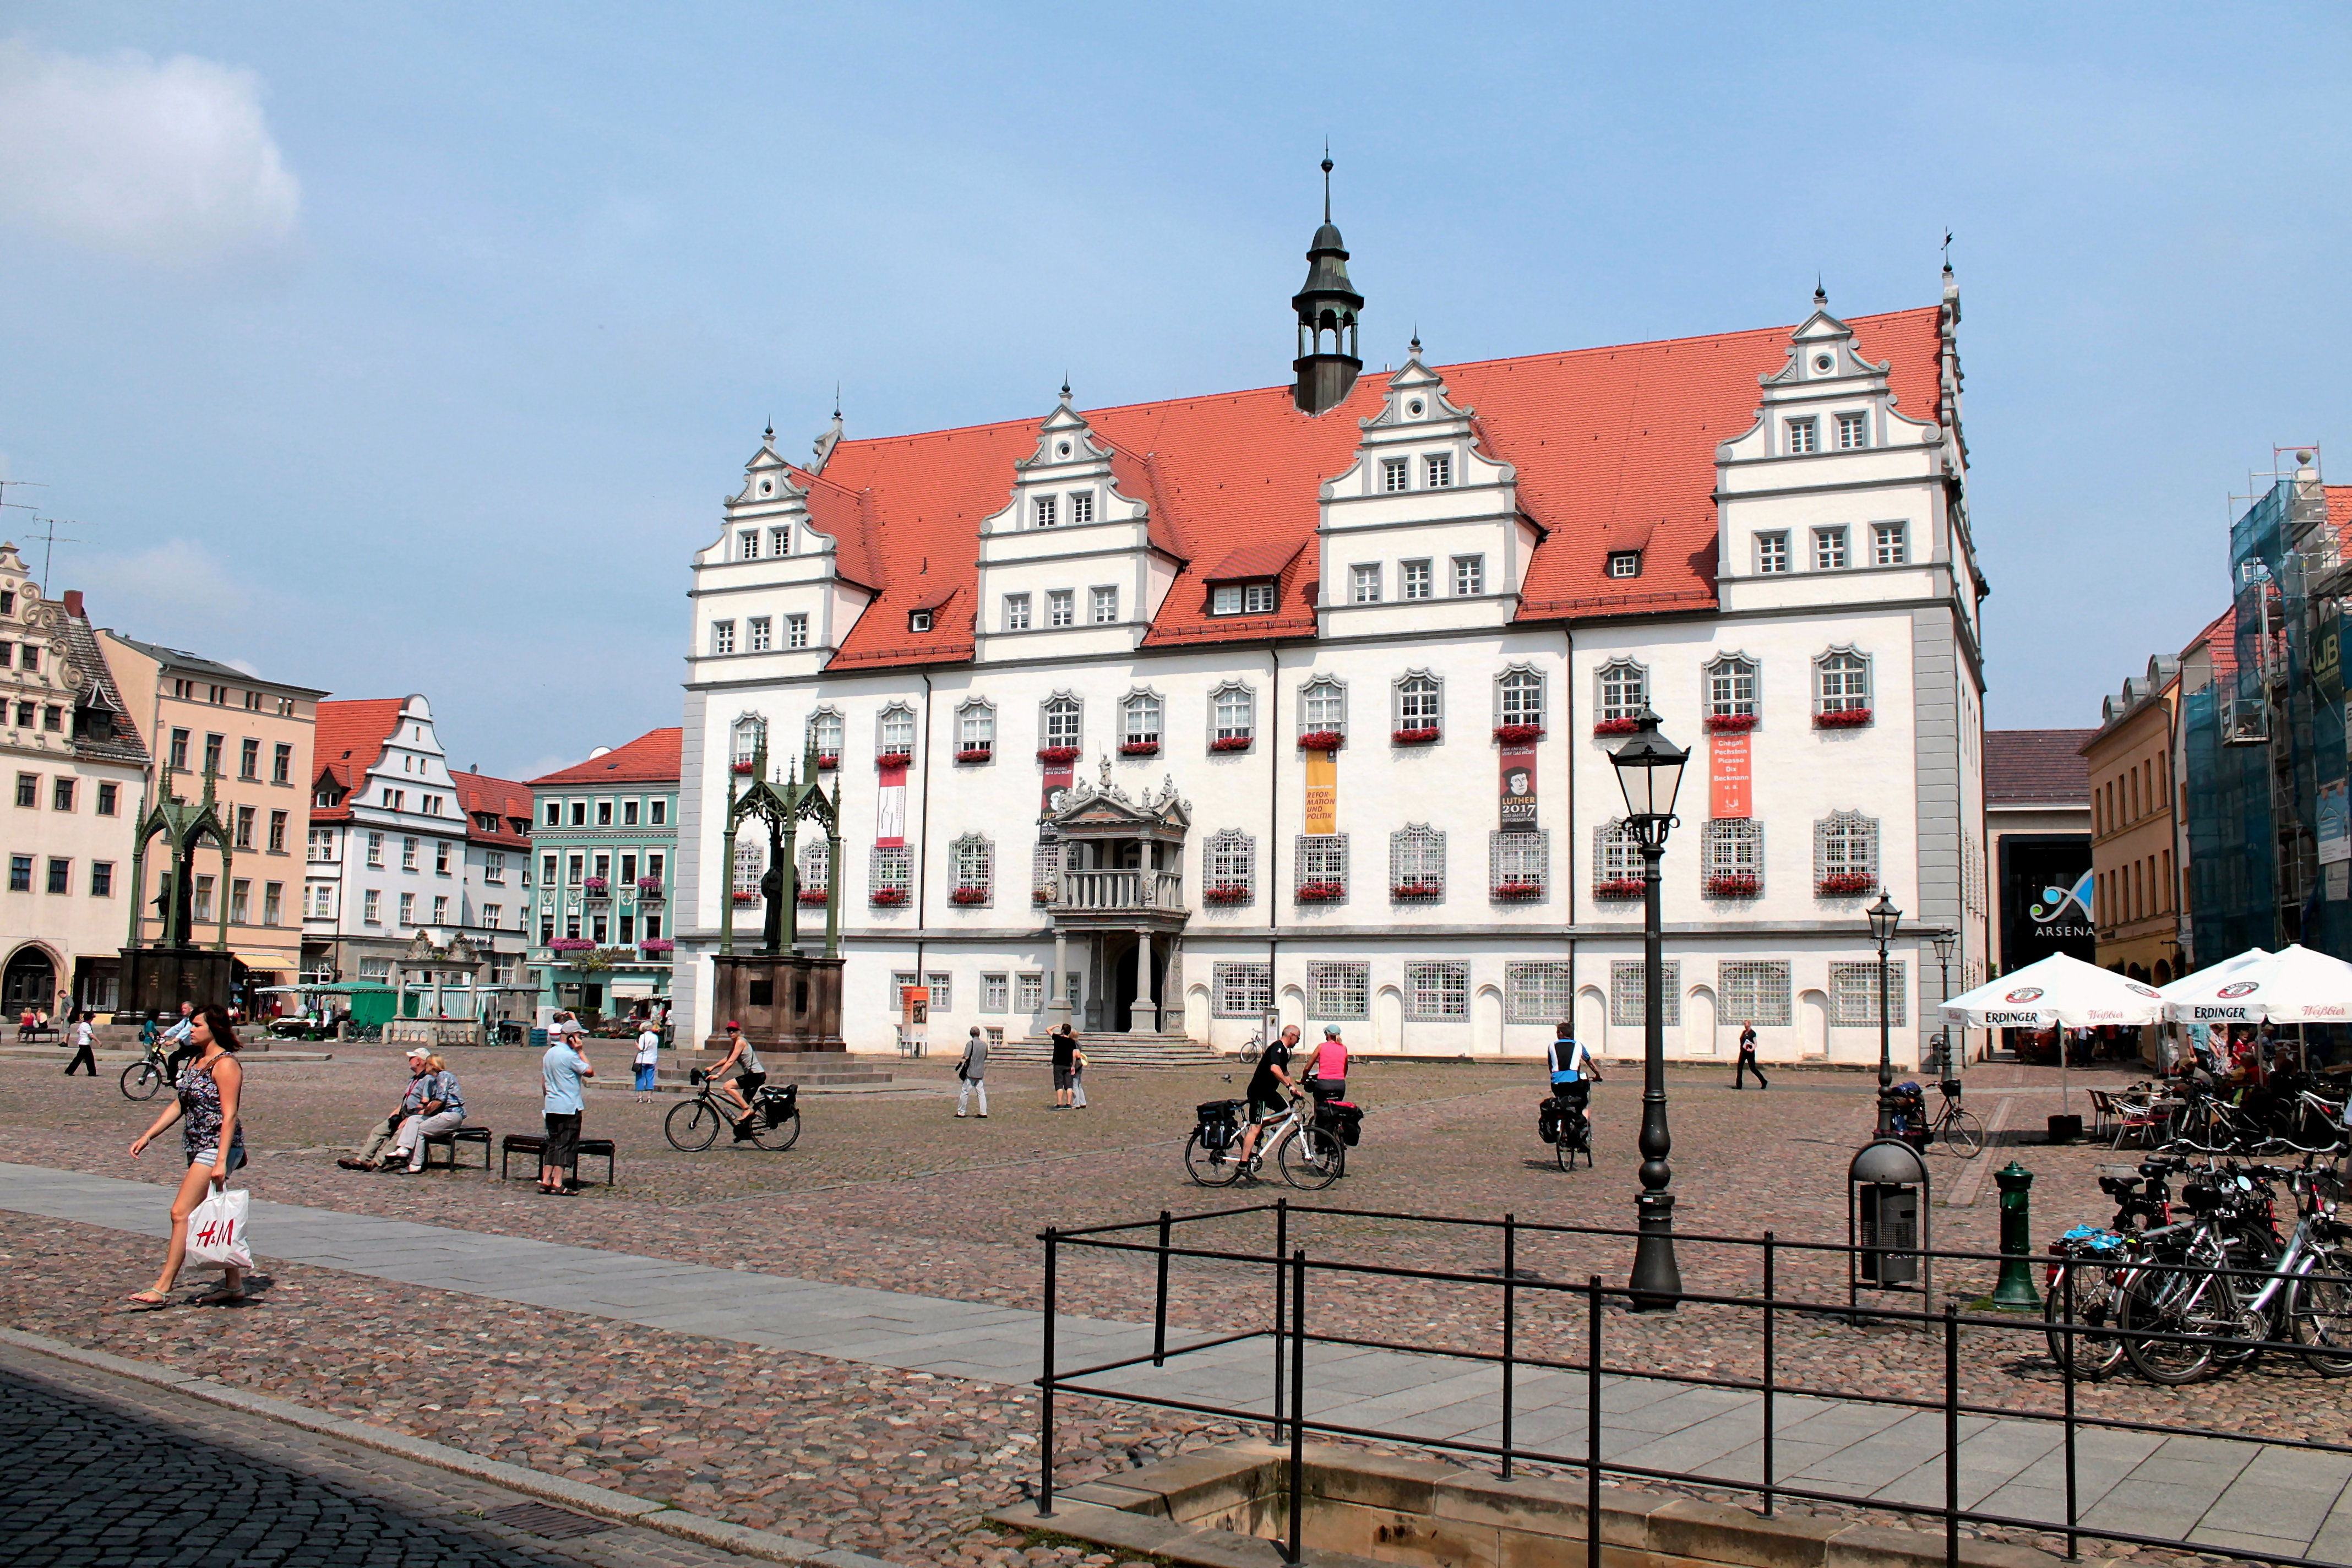 file lutherstadt wittenberg marktplatz mit altem rathaus. Black Bedroom Furniture Sets. Home Design Ideas